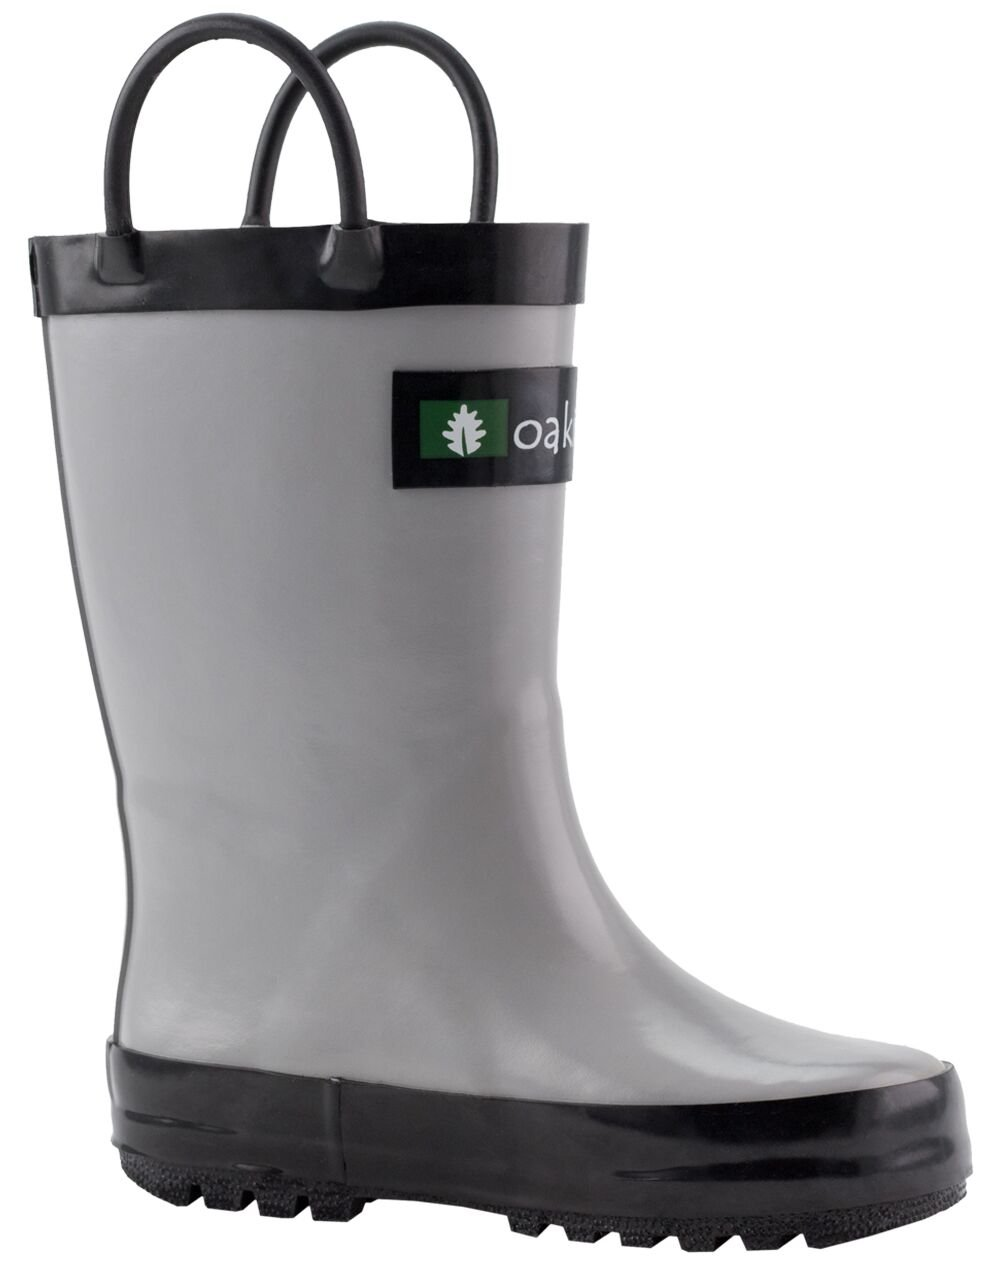 Oakiwear Kids Waterproof Rubber Rain Boots with Easy-On Handles, Gray & Black, 4T US Toddler